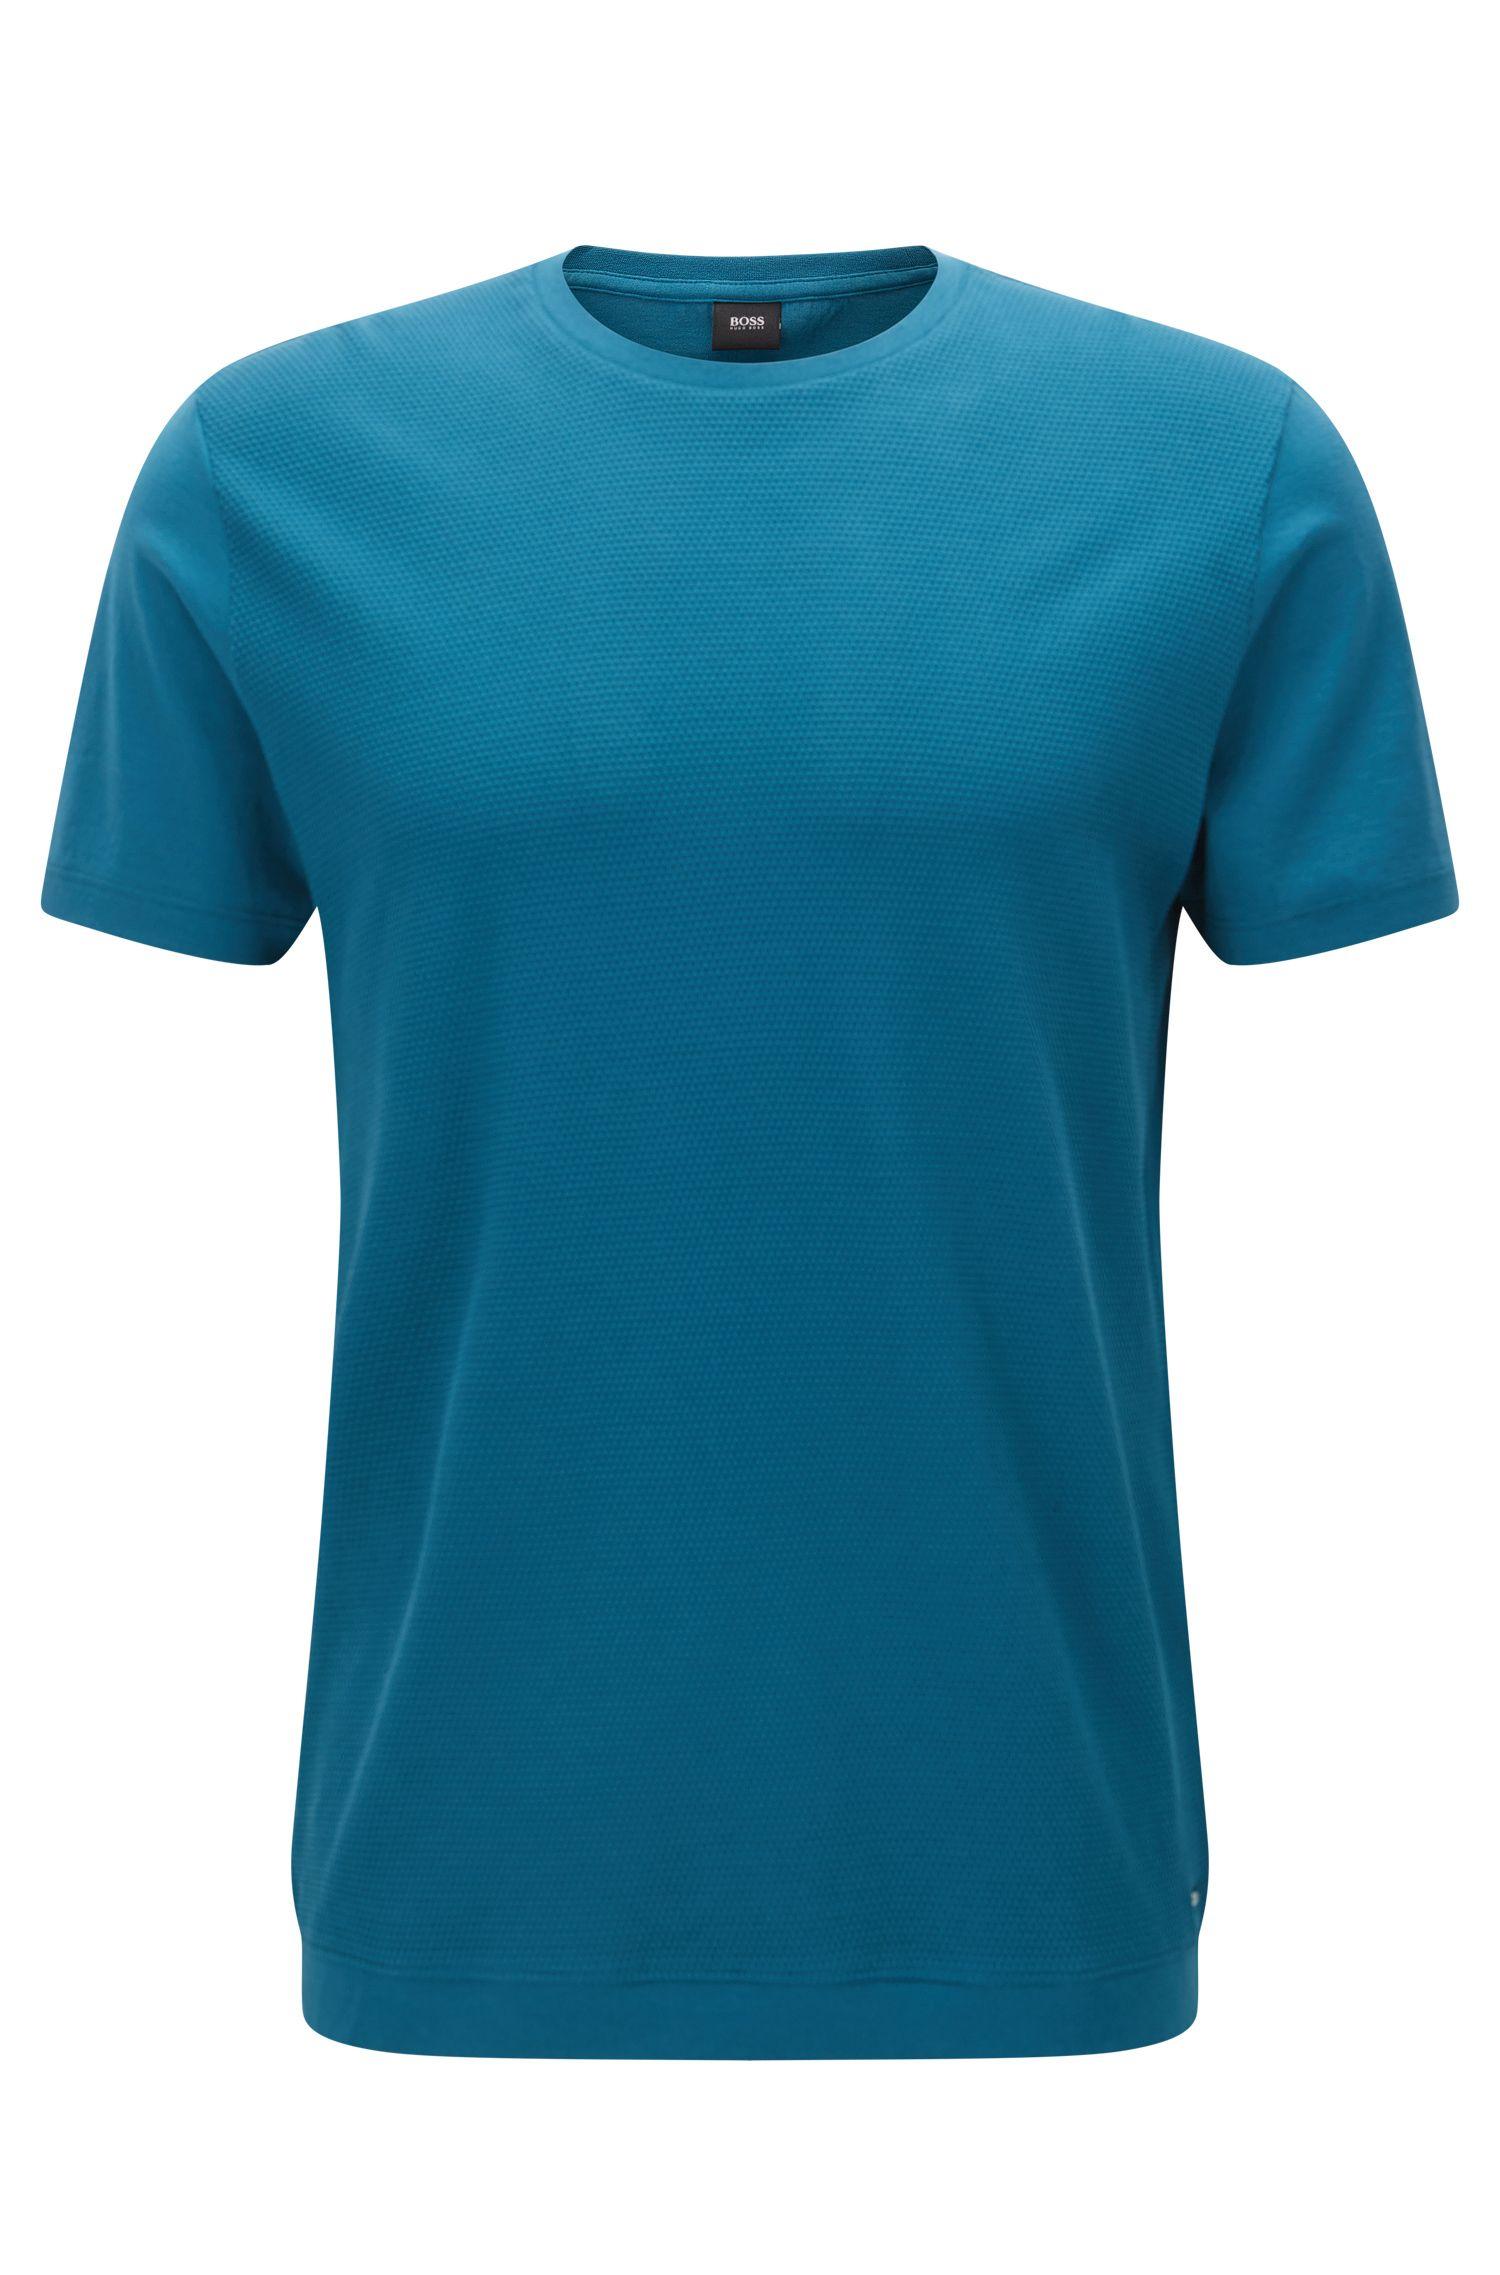 Camiseta de cuello redondo con panel frontal con textura